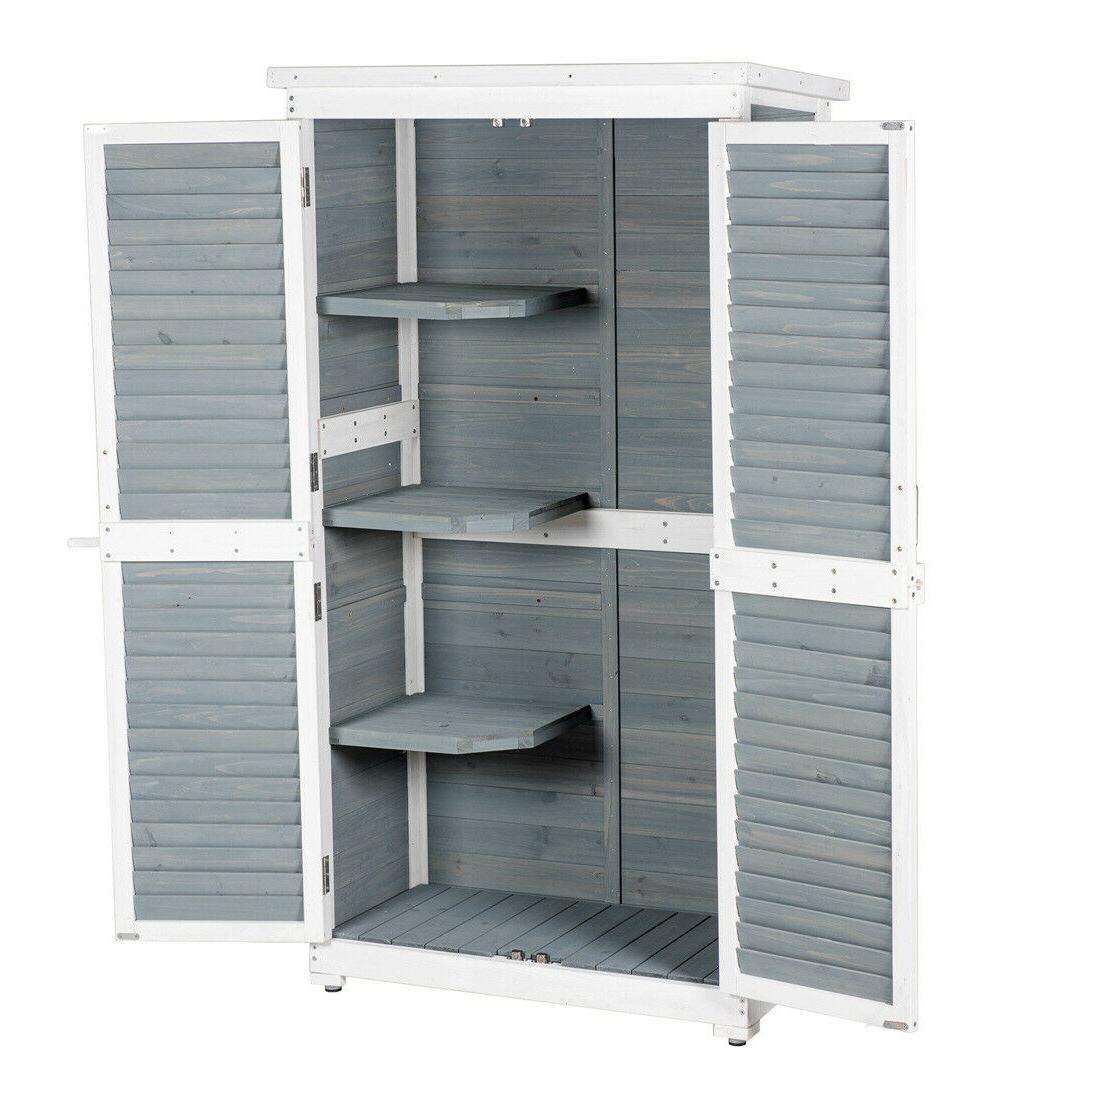 Outdoor Garden Nature Wood Storage Cabinet Waterproof Tool Shed Blinds Lockers